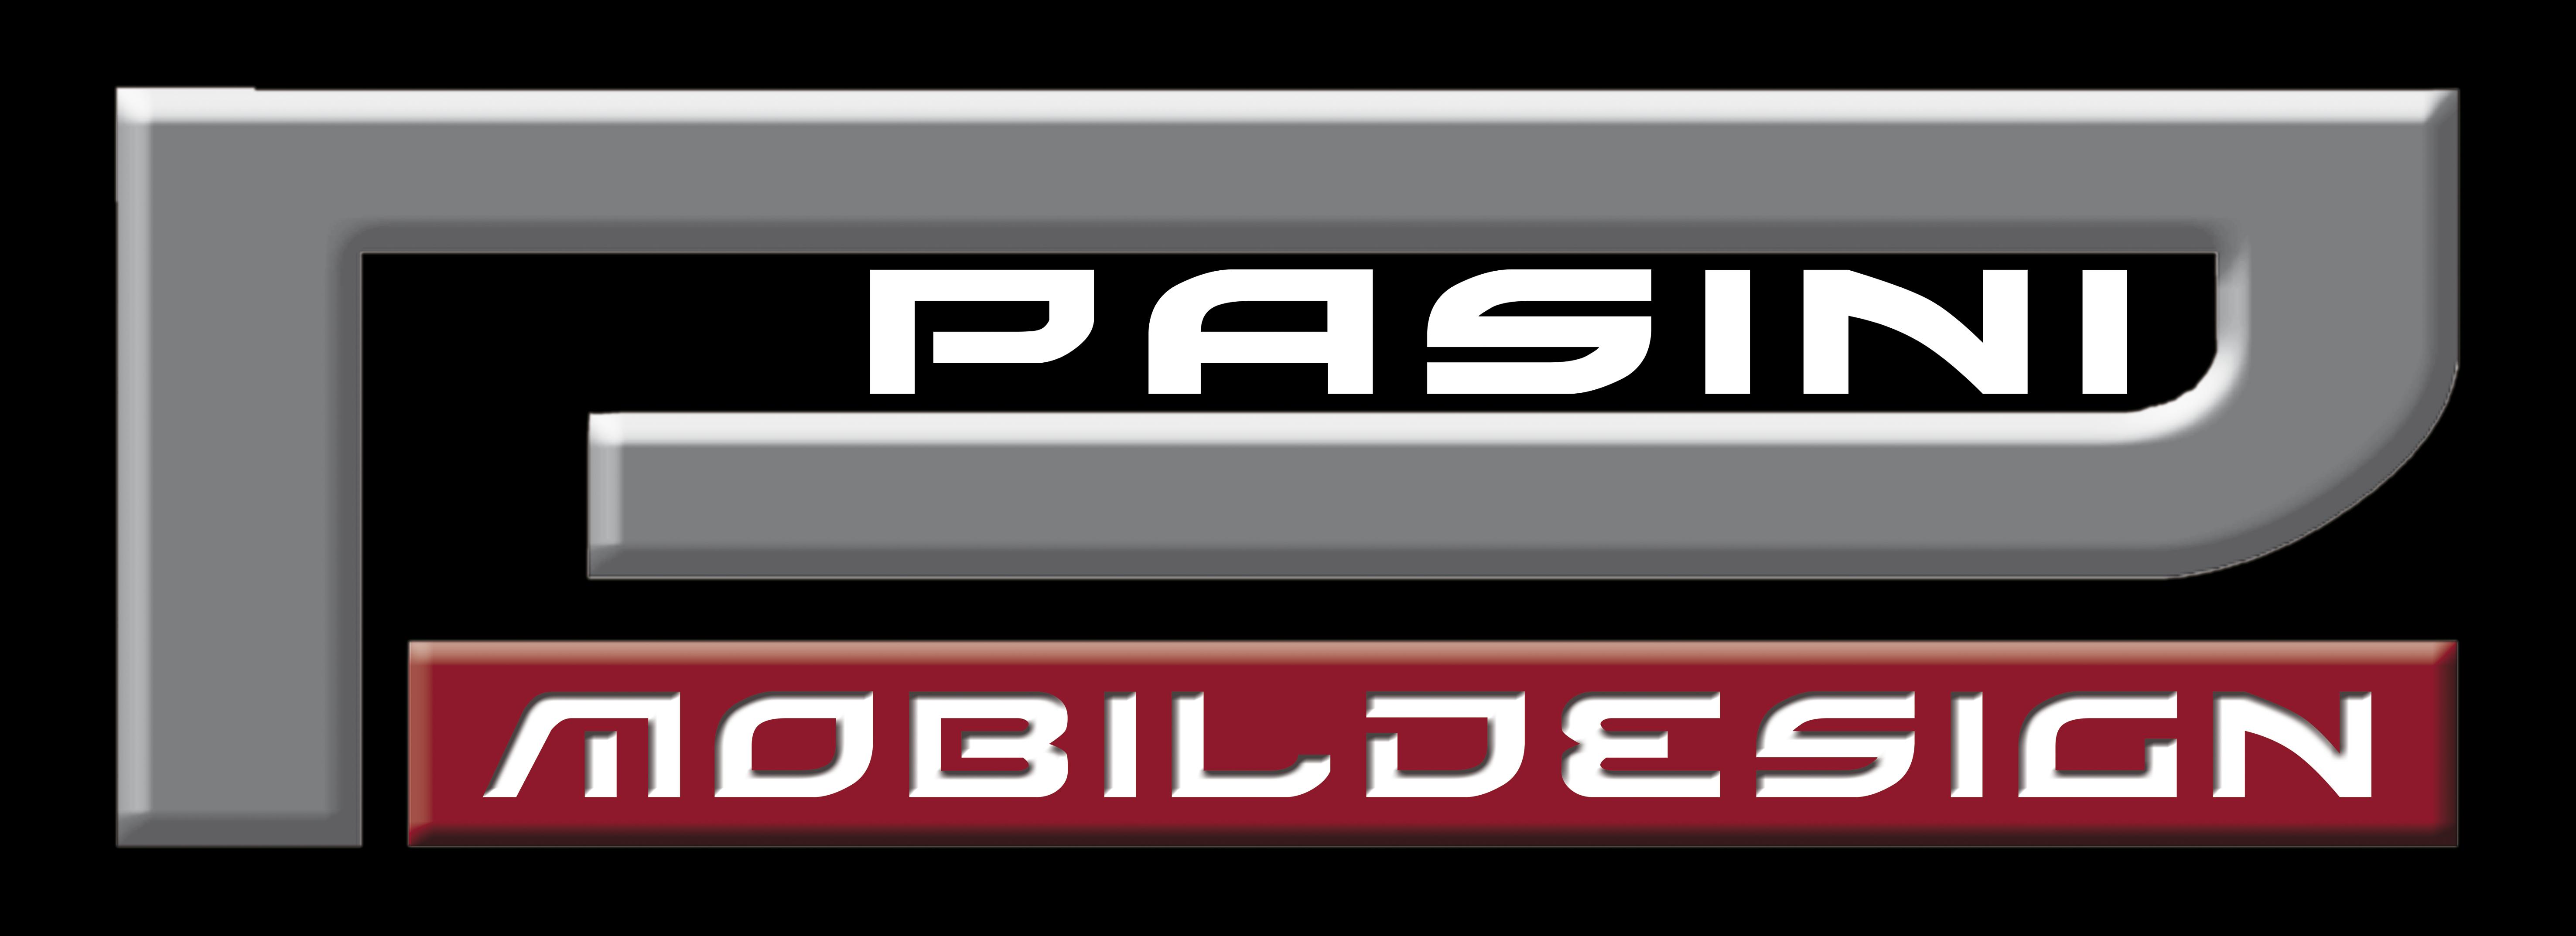 PASINI MOBILDESIGN logo